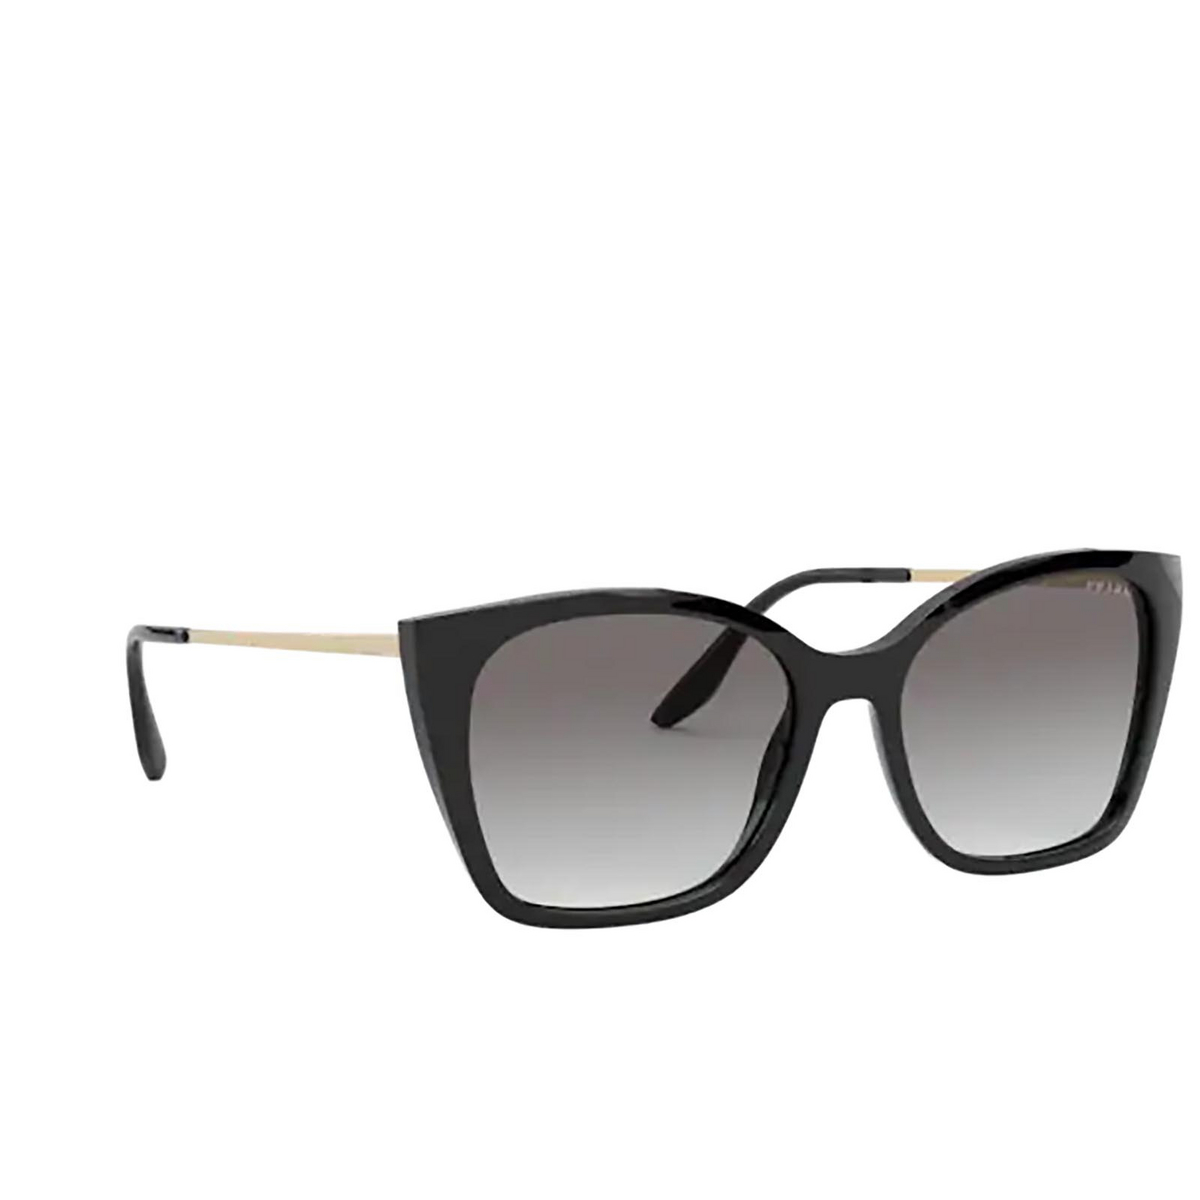 Prada® Cat-eye Sunglasses: PR 12XS color Black 1AB0A7 - three-quarters view.